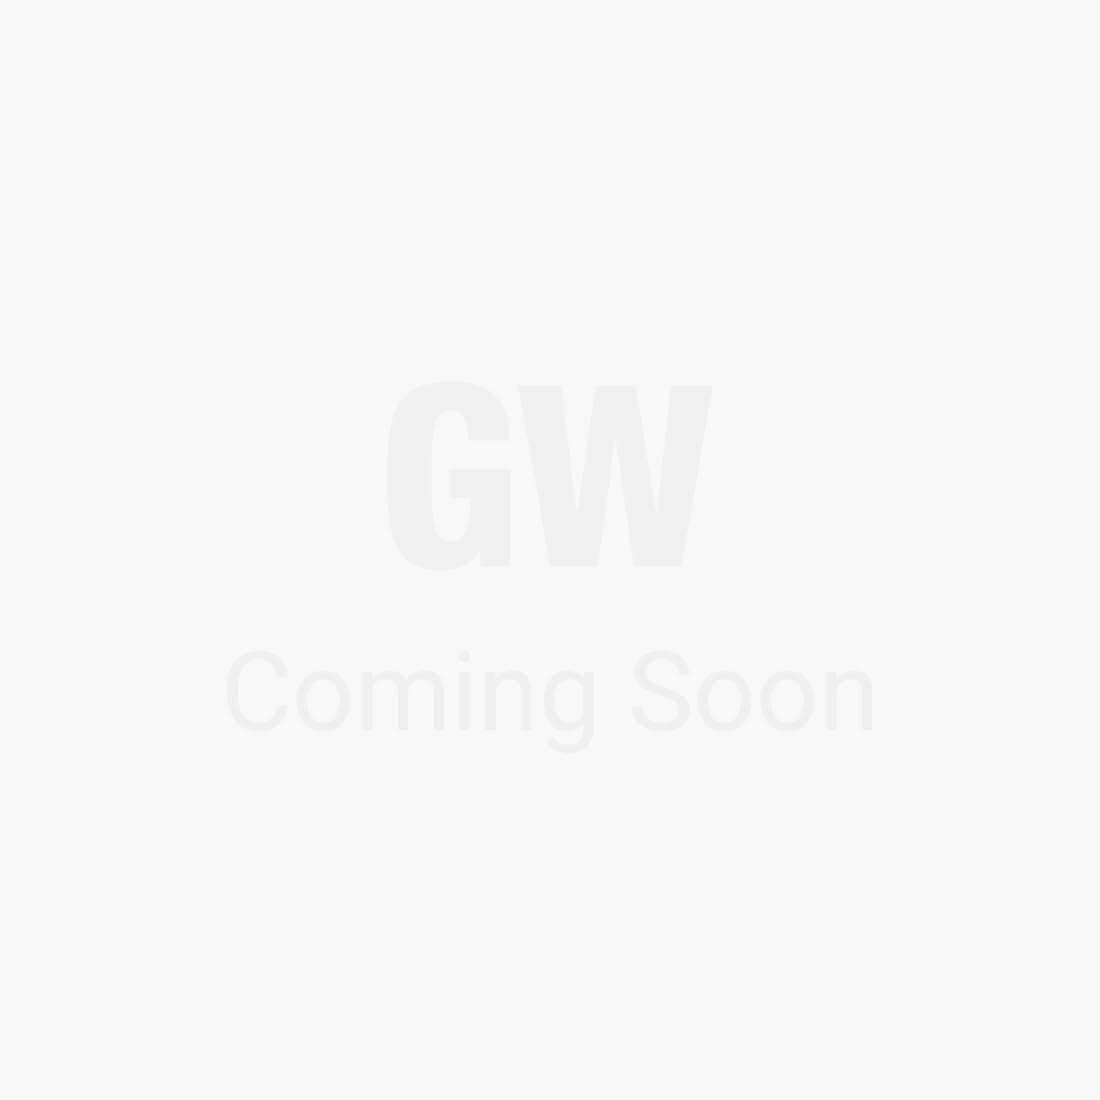 Wilomena 3 Seater Sofa